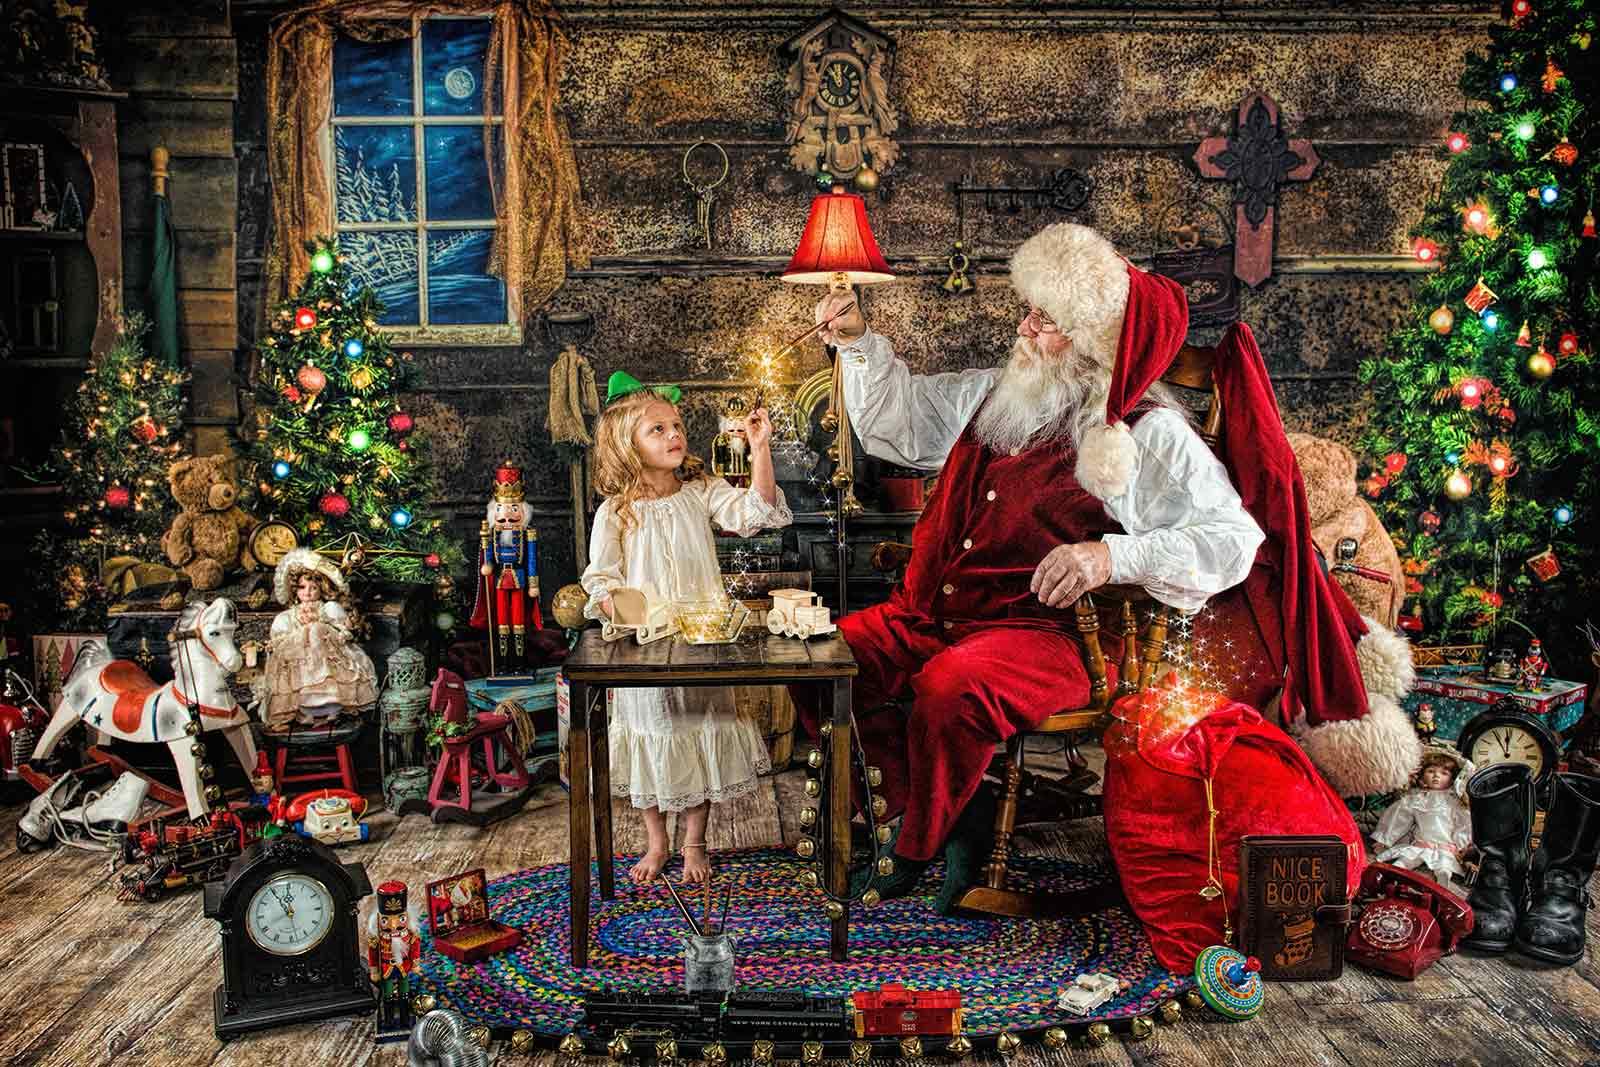 012_Magic-of-Santa-Anna-Thielen-Photography